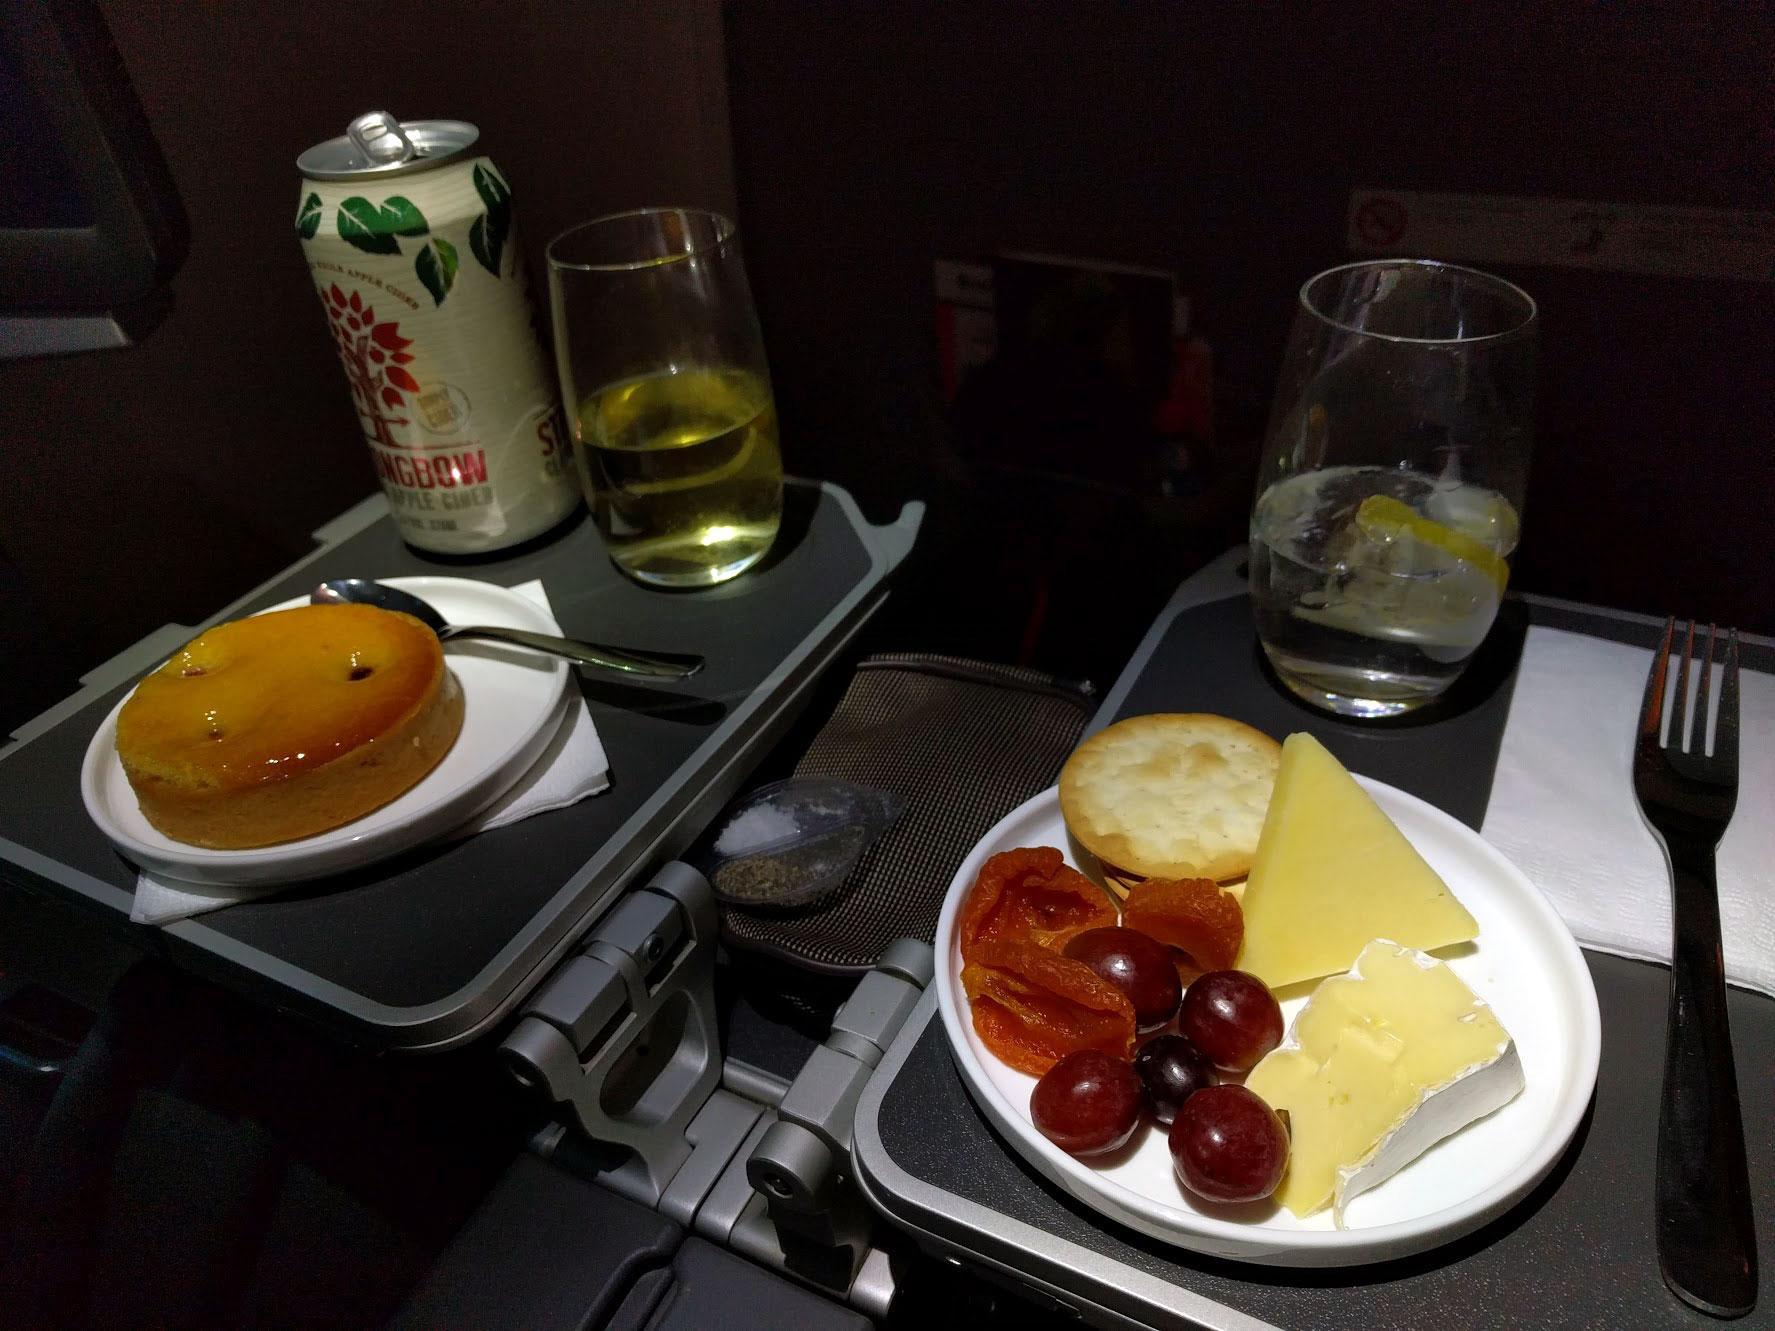 Jetstar Dessert